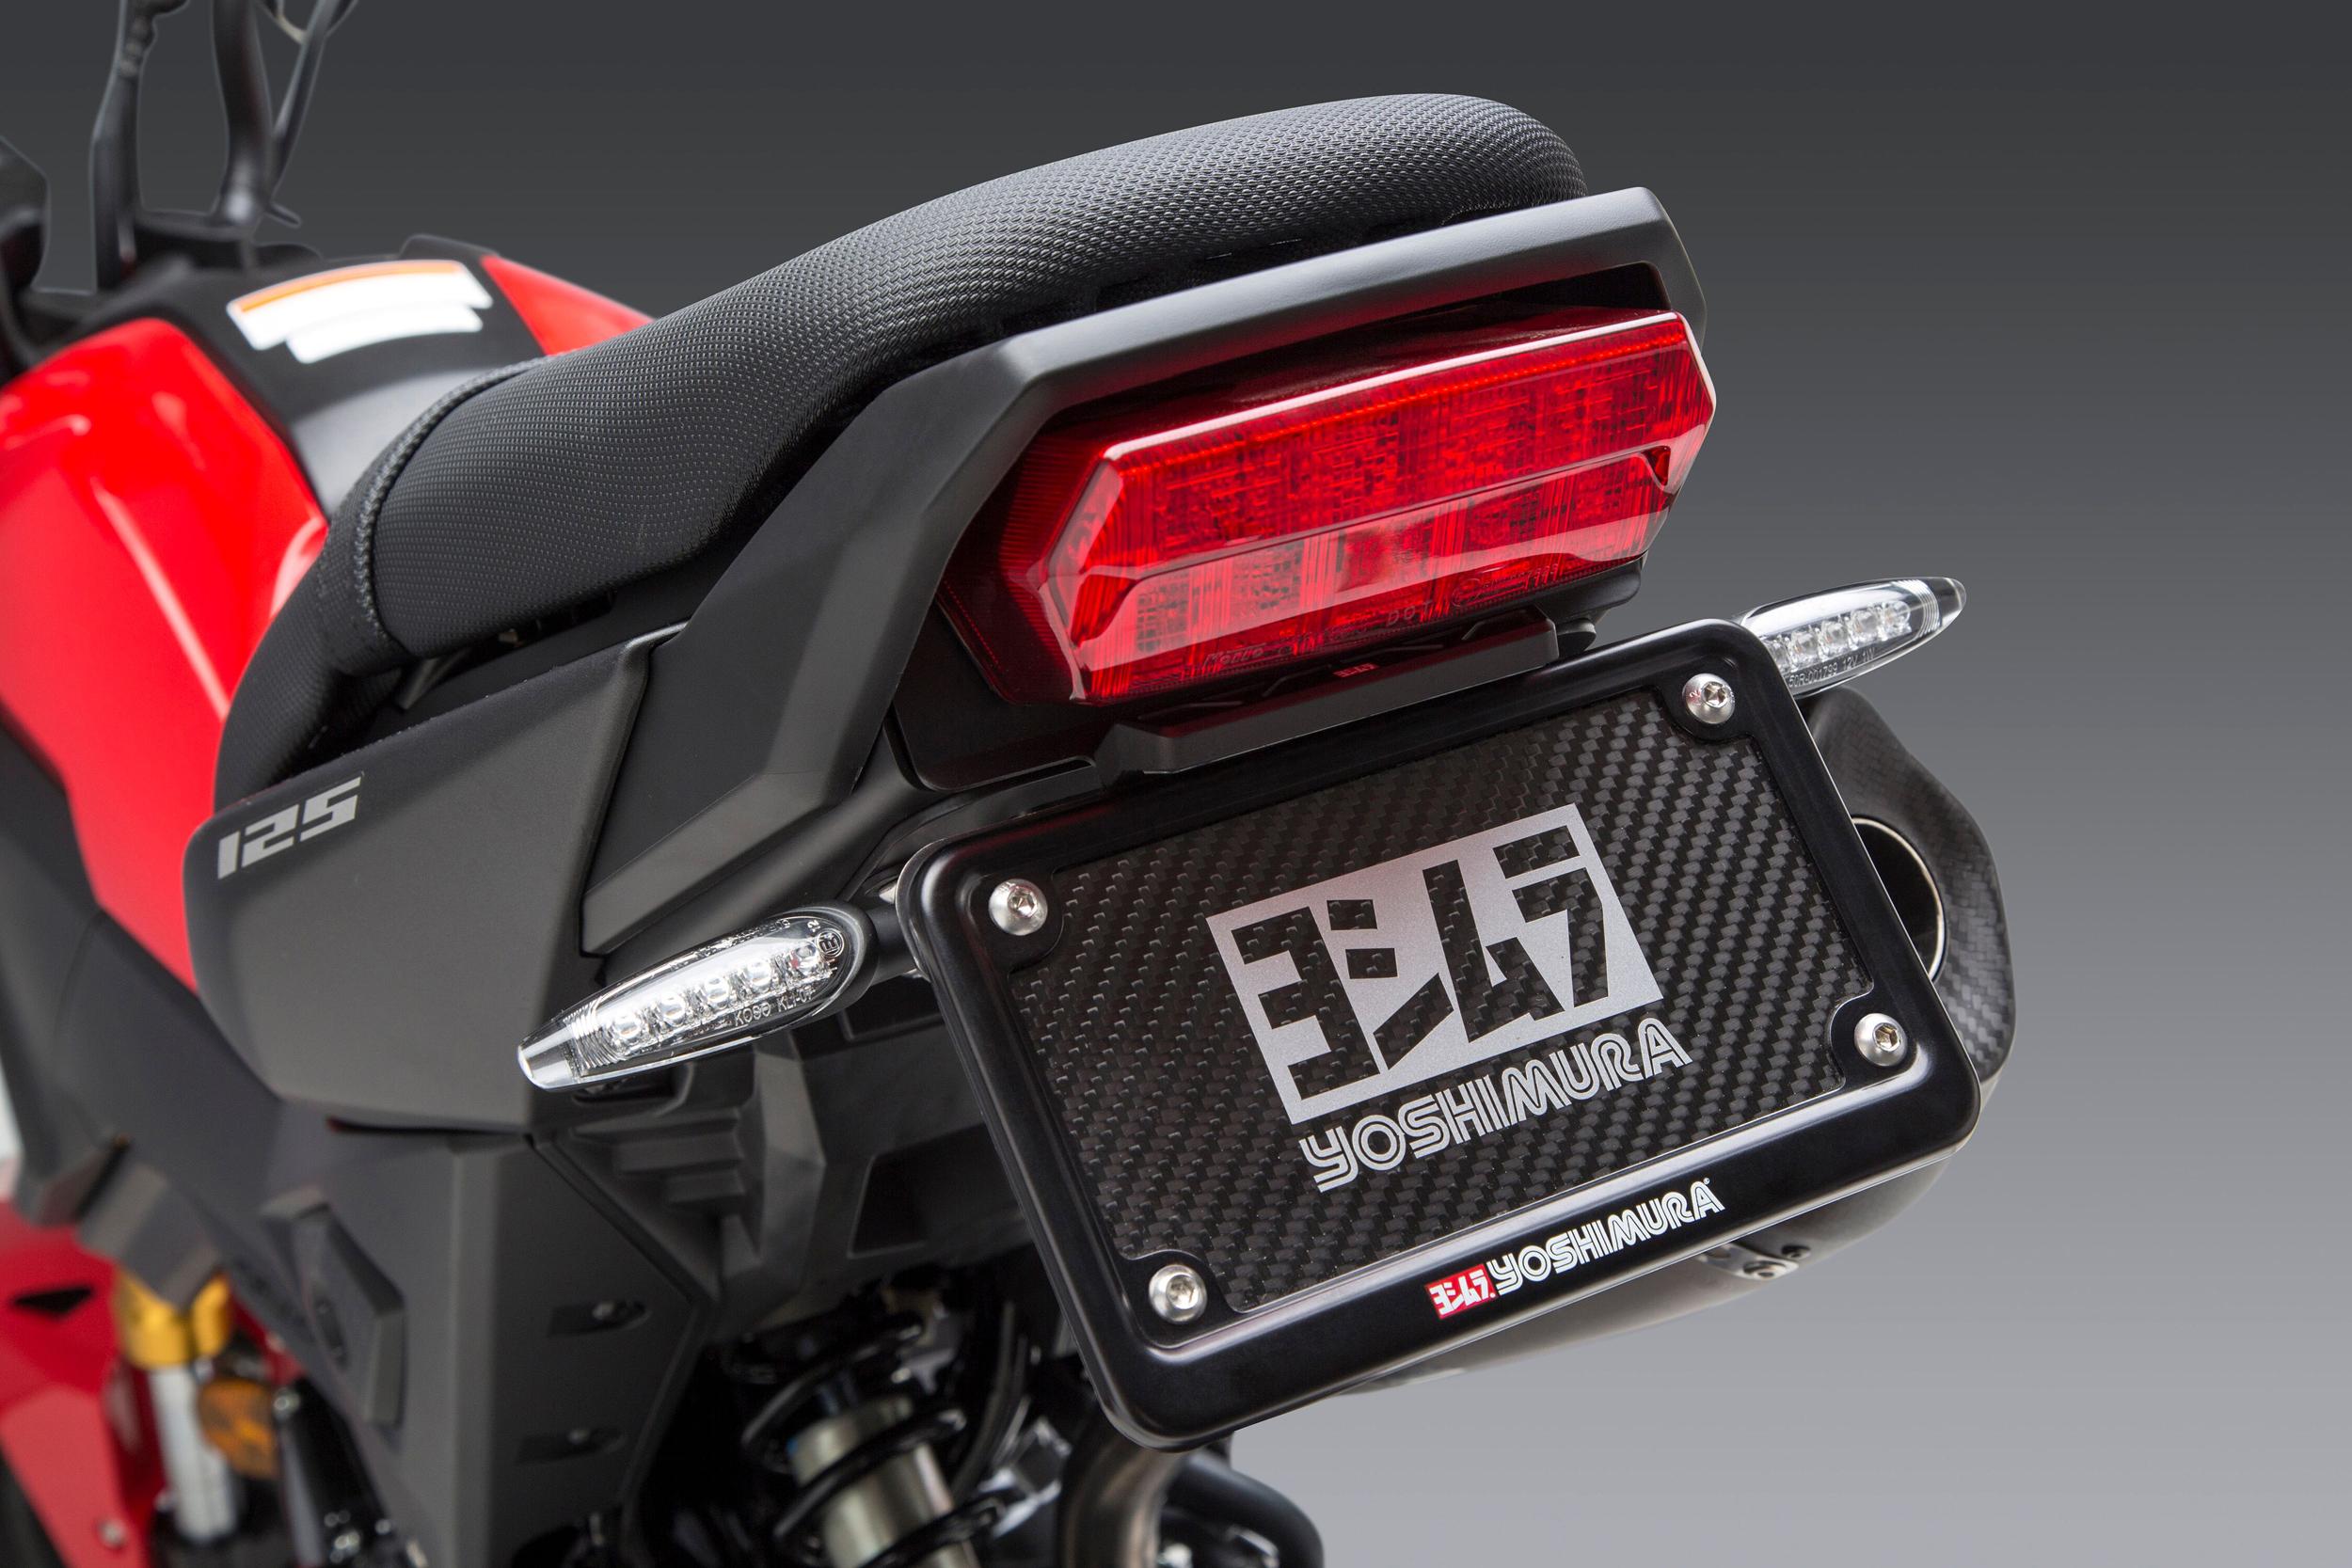 Yoshimura High Mount Universal Turn Signal Brackets Kit as seen here on the Honda MSX 125